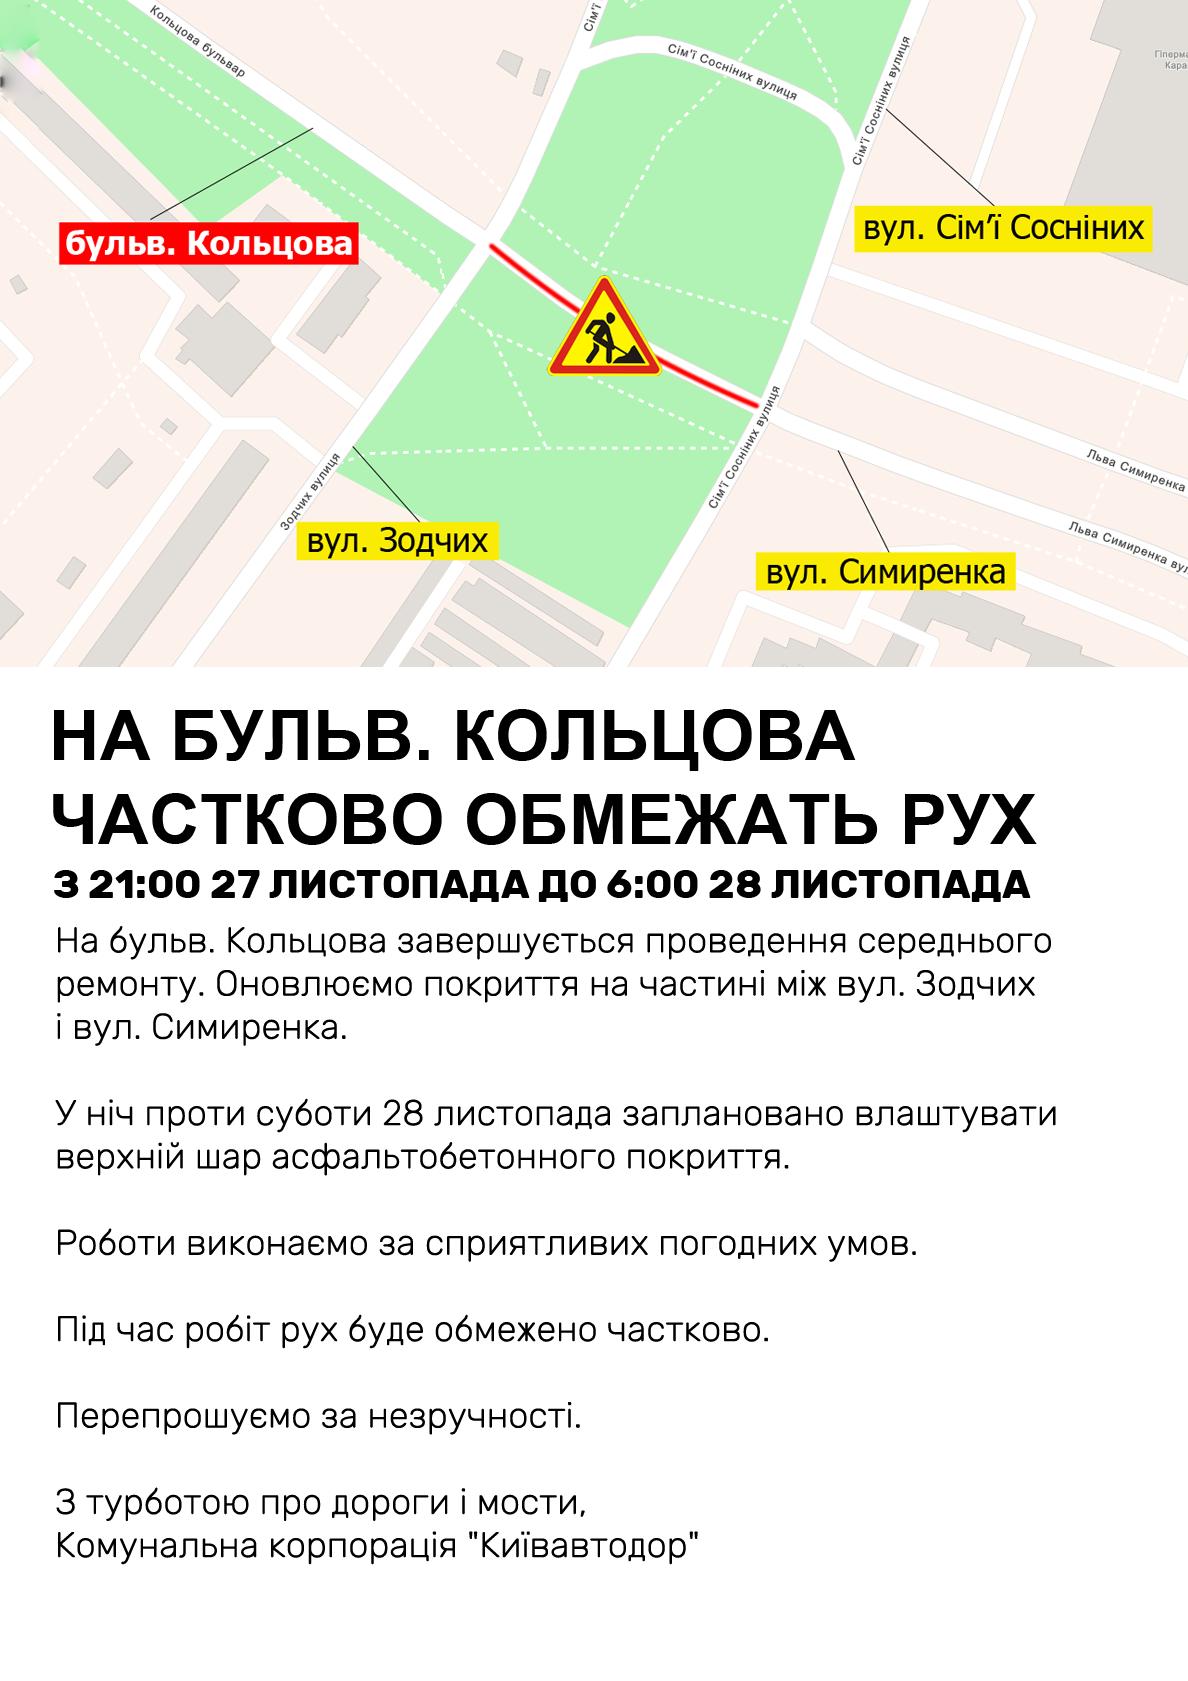 На естакаді Південного мосту частково обмежать рух - ремонт дороги, Київавтодор, дорога - 127907648 1611554705694070 5585908257622303896 o